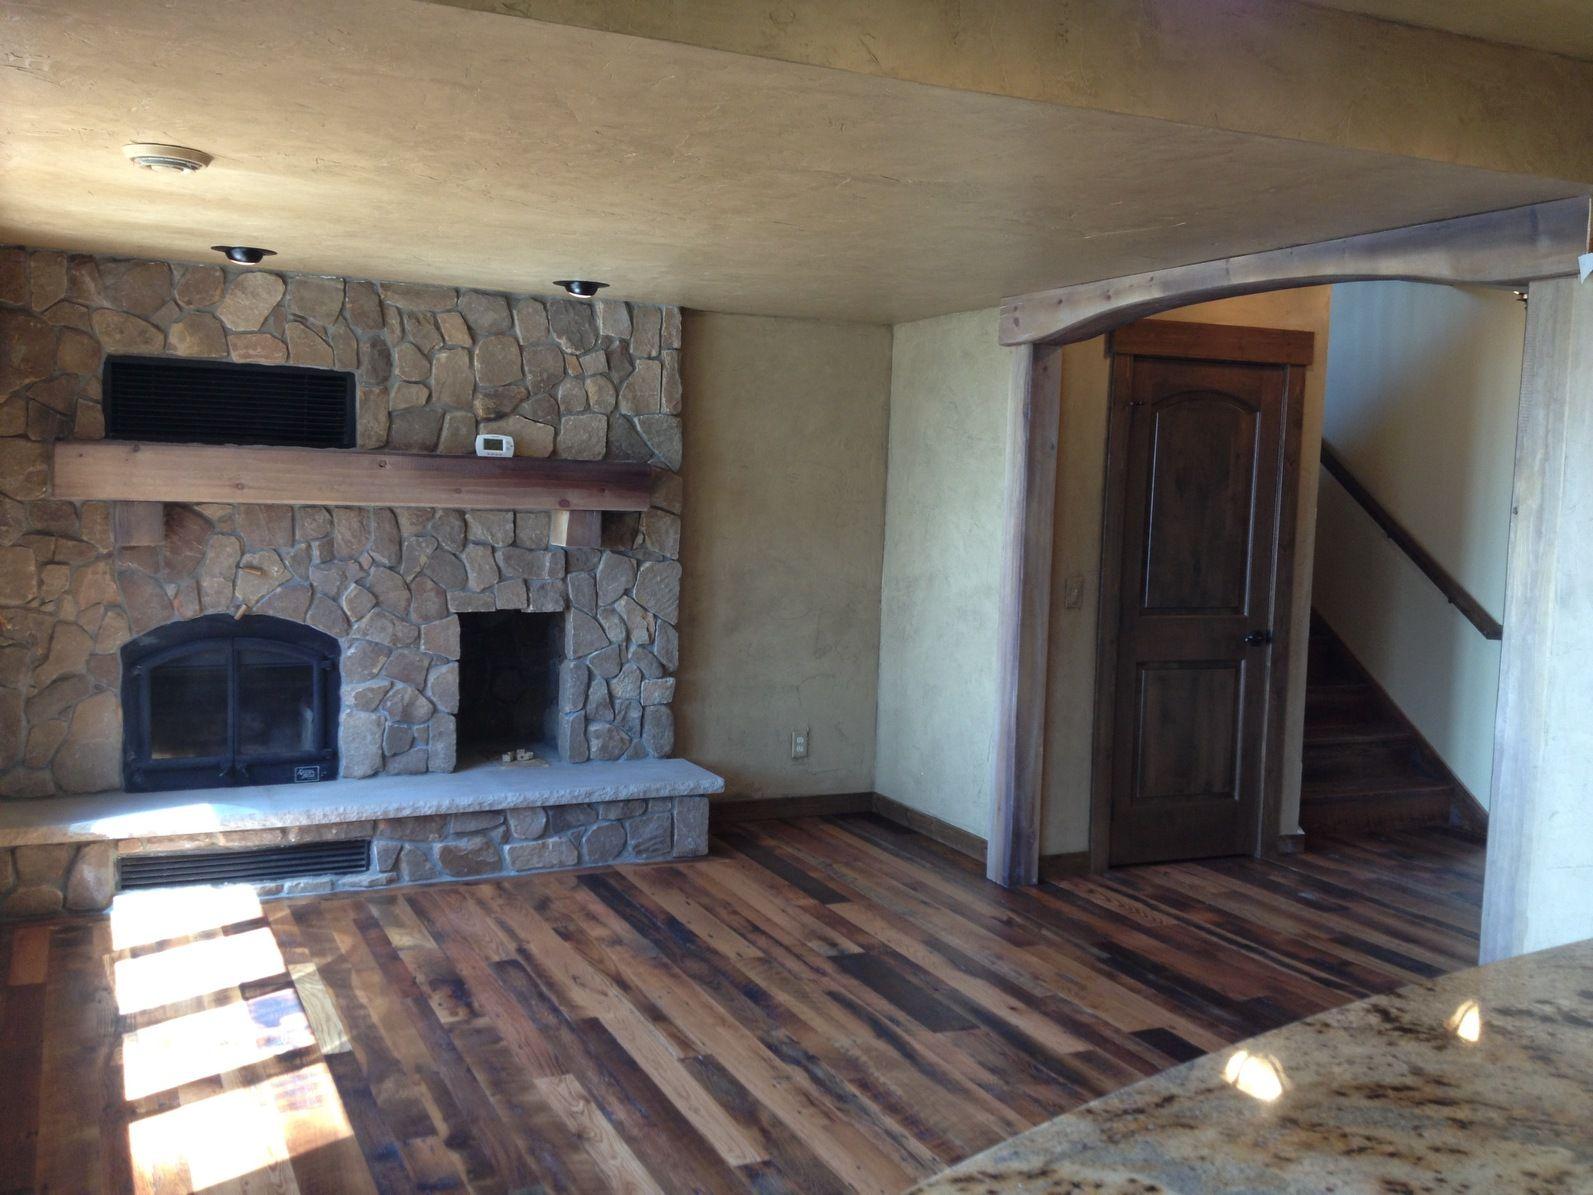 Tobacco Barnwood Flooring coordinated with Textured Walls